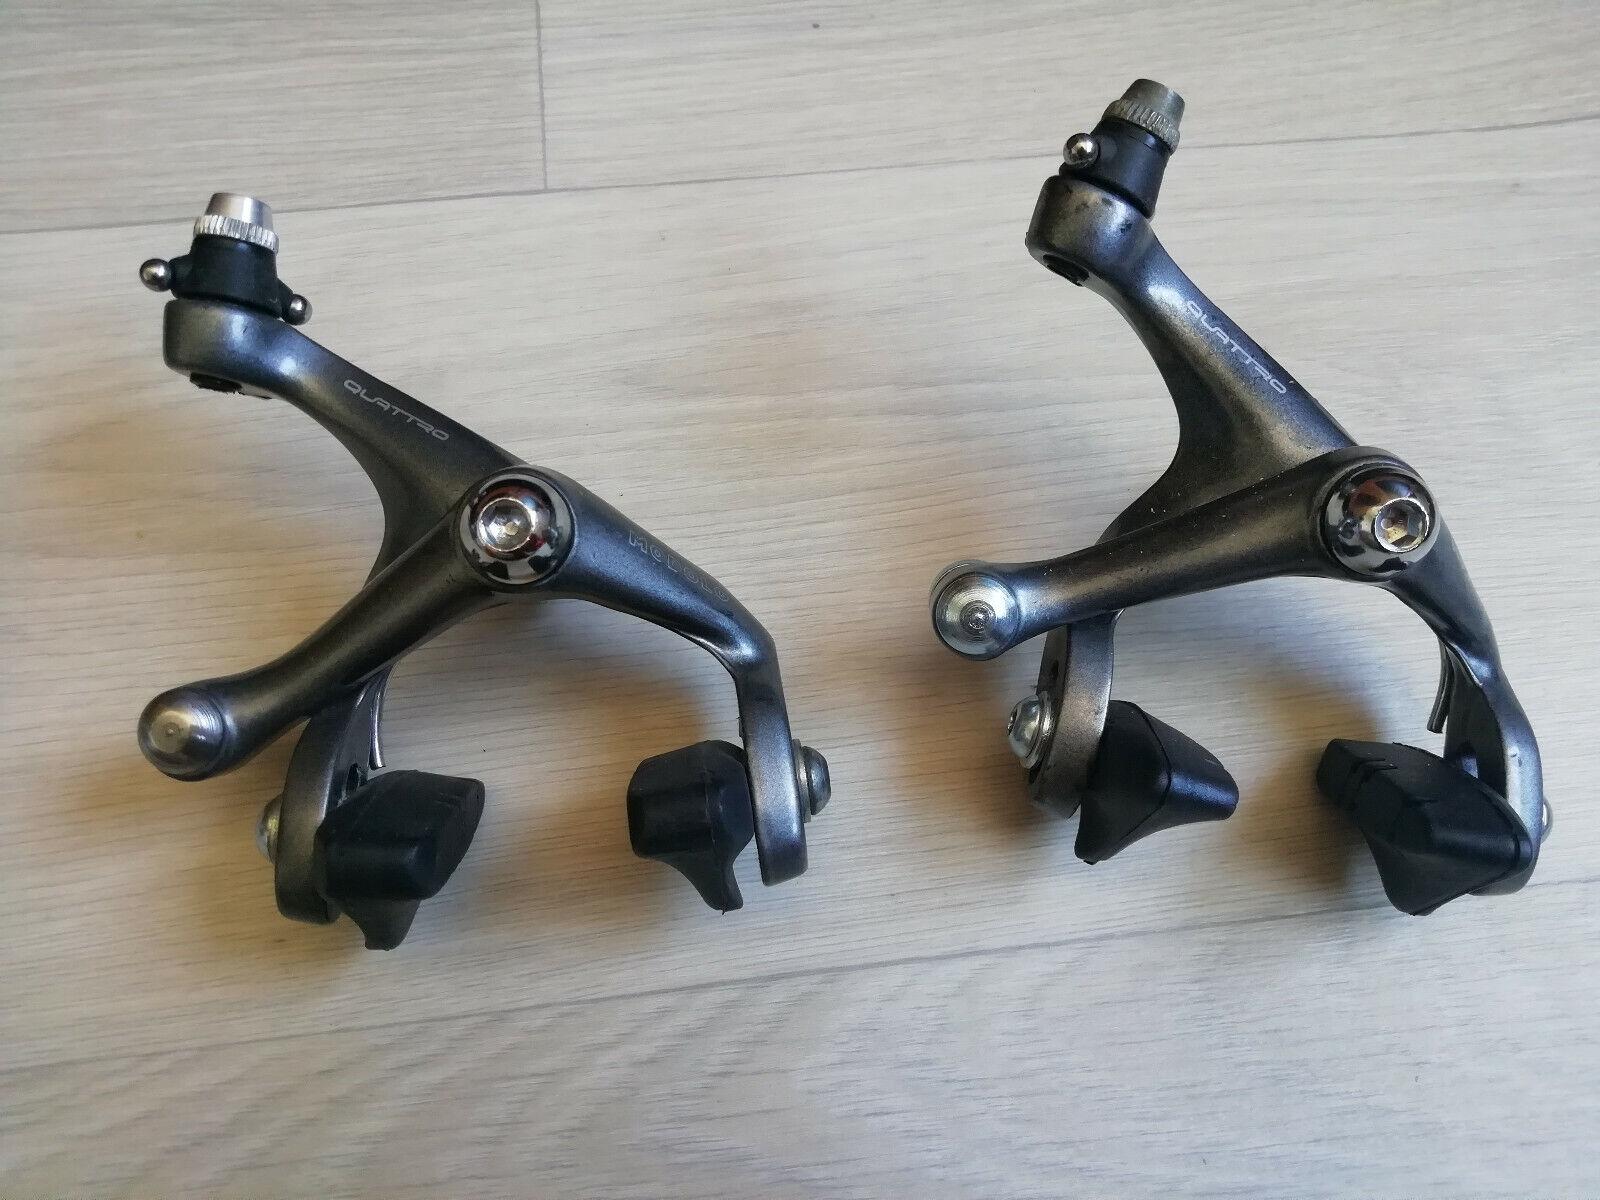 Modolo  Quattro vintage aero brakes  great offers